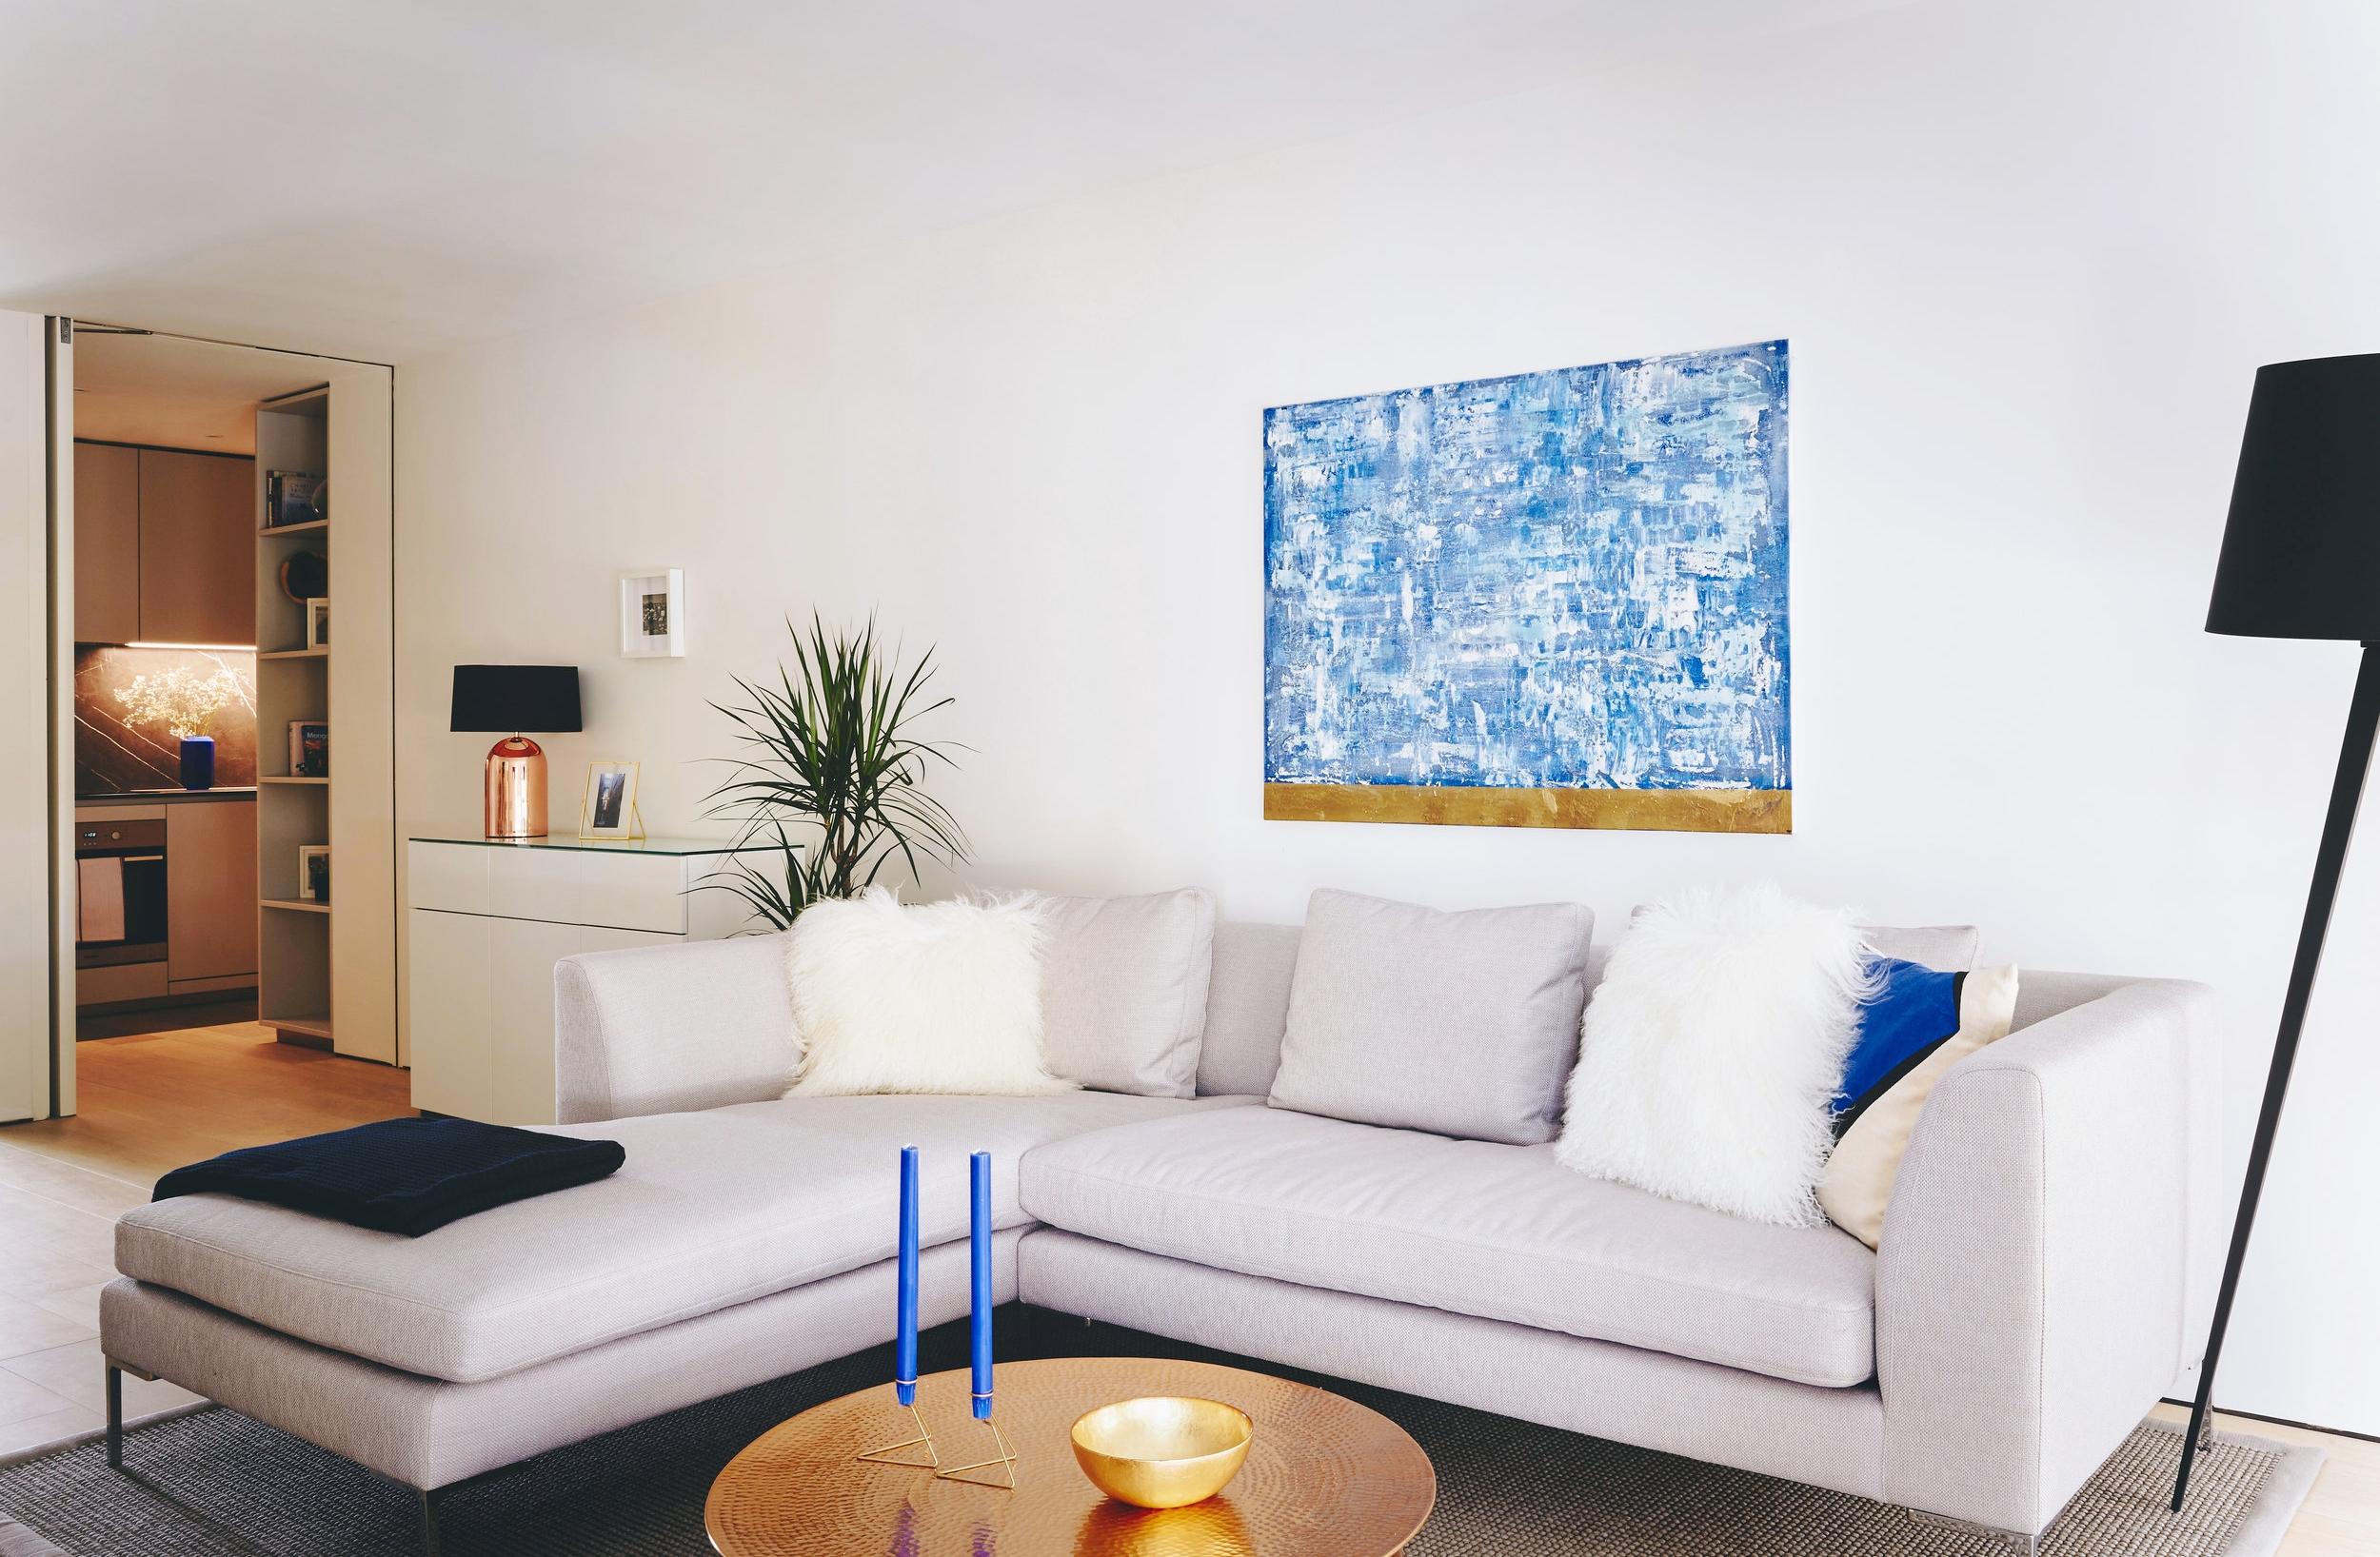 Living Room Interiors Cuckooz Shoreditch Studionatalie Natalie Papageorgiadis